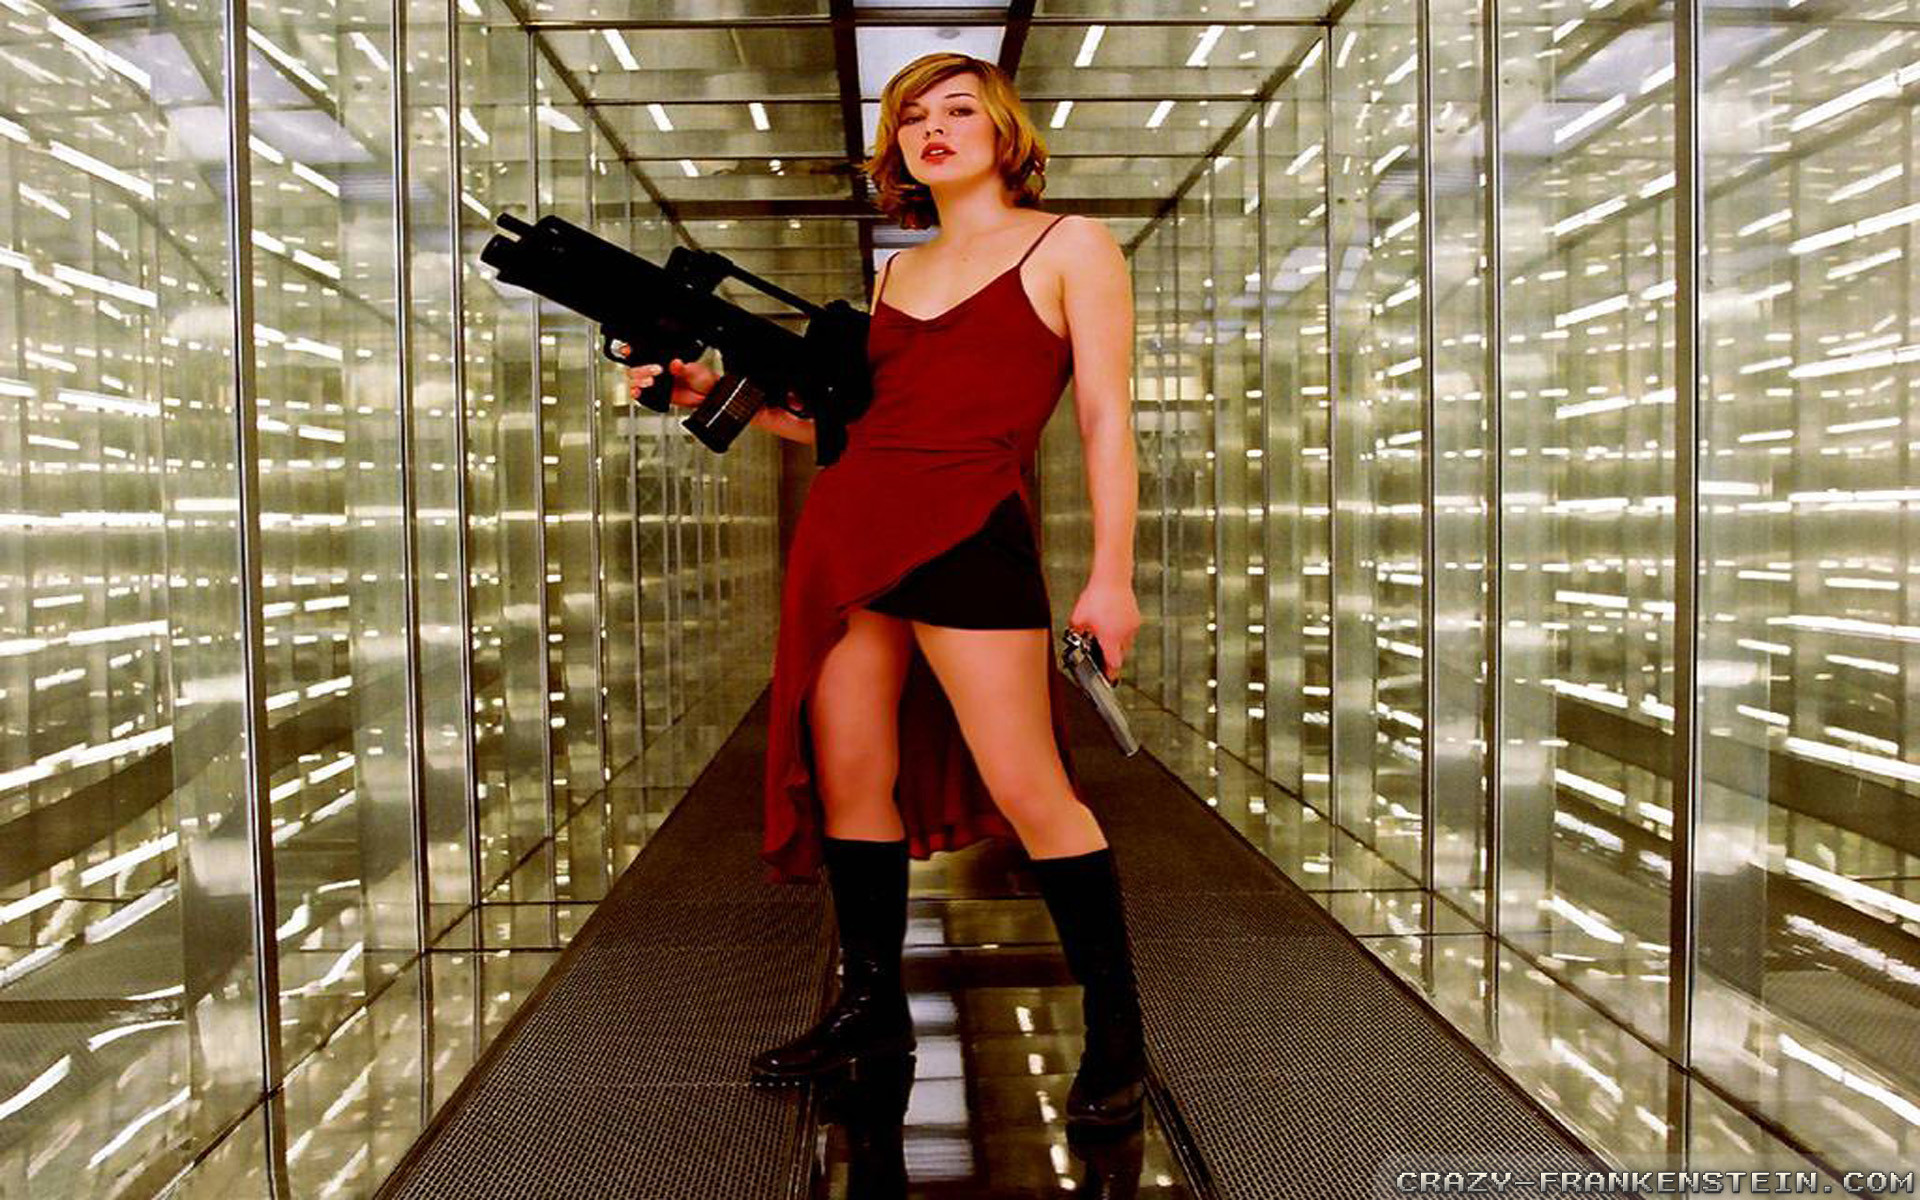 Wallpaper: Milla Jovovich making movie. Resolution: 1024×768 | 1280×1024 |  1600×1200. Widescreen Res: 1440×900 | 1680×1050 | 1920×1200